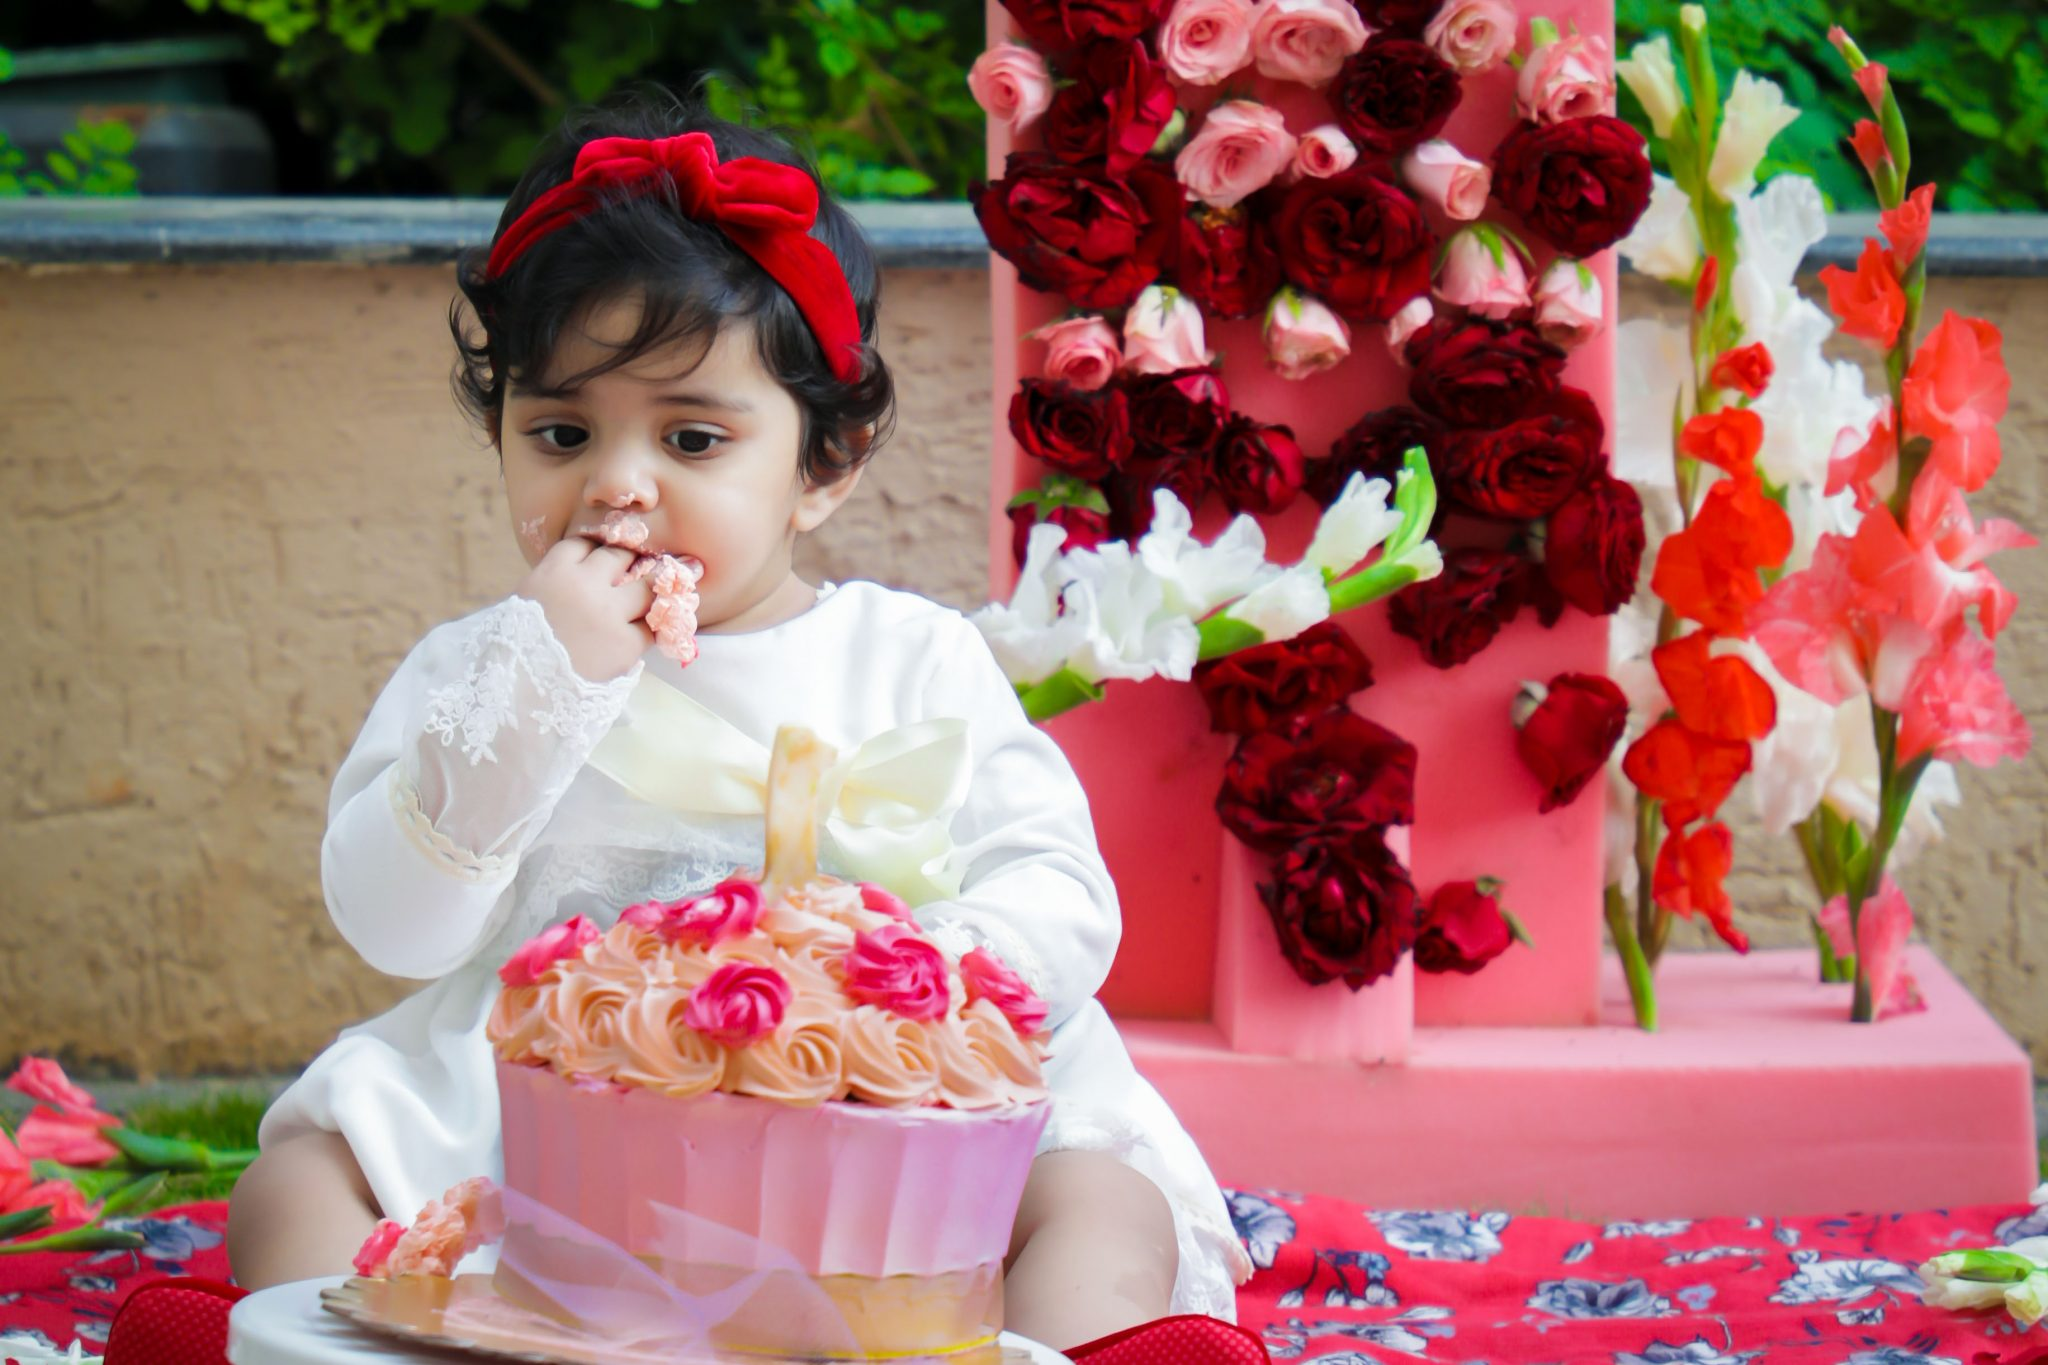 cake smaash photography hyderabad digiart photography 9298051870